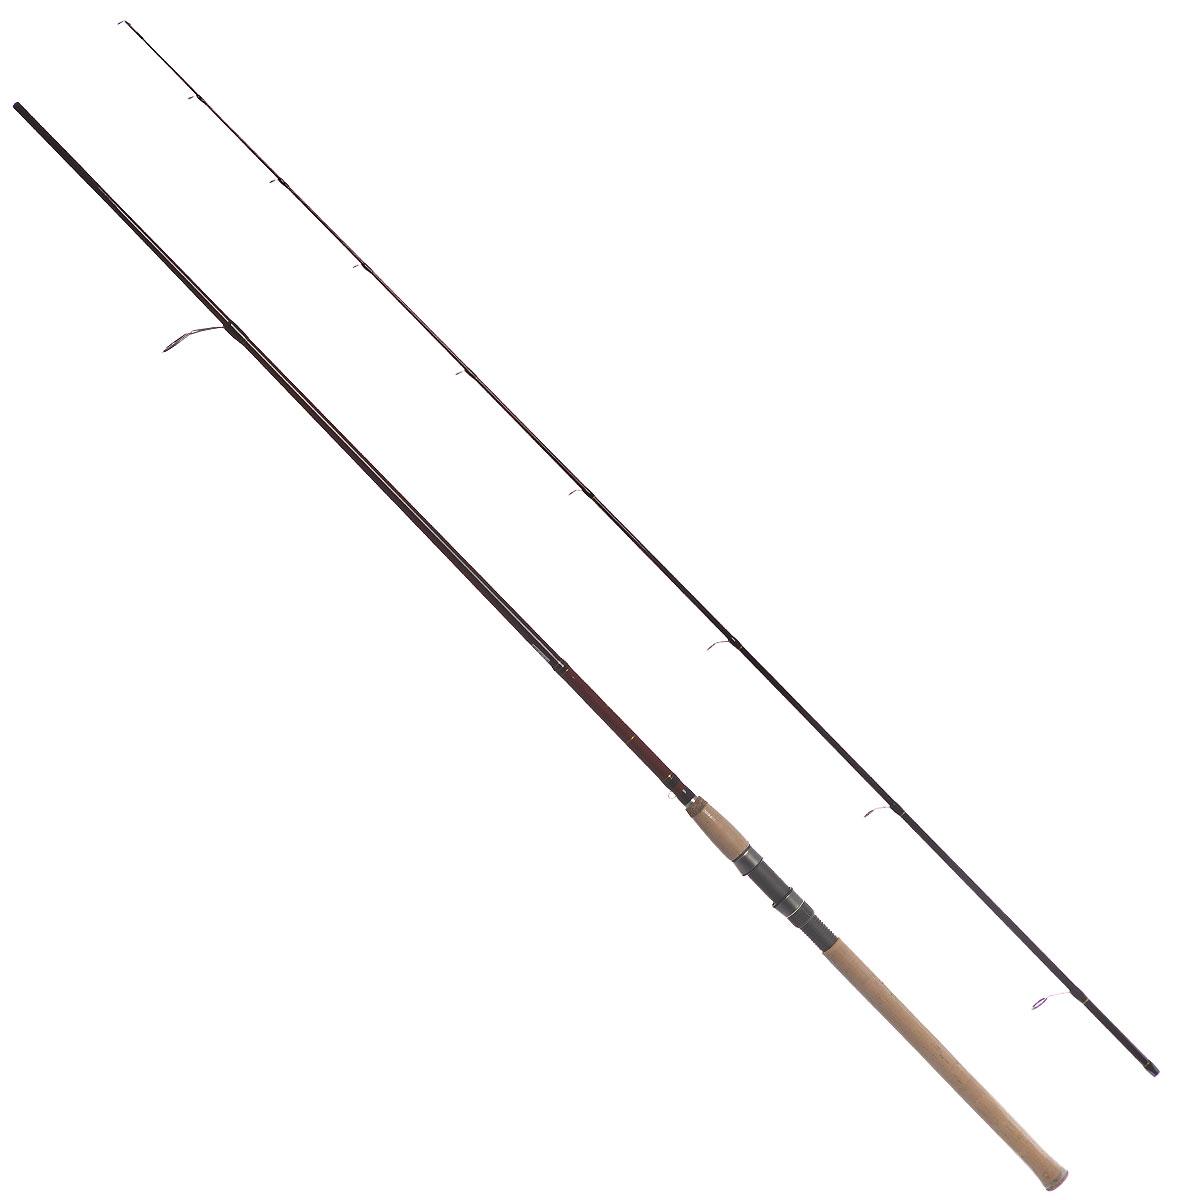 Спиннинг штекерный Daiwa Vulcan Supreme, 3 м, 7-28 г